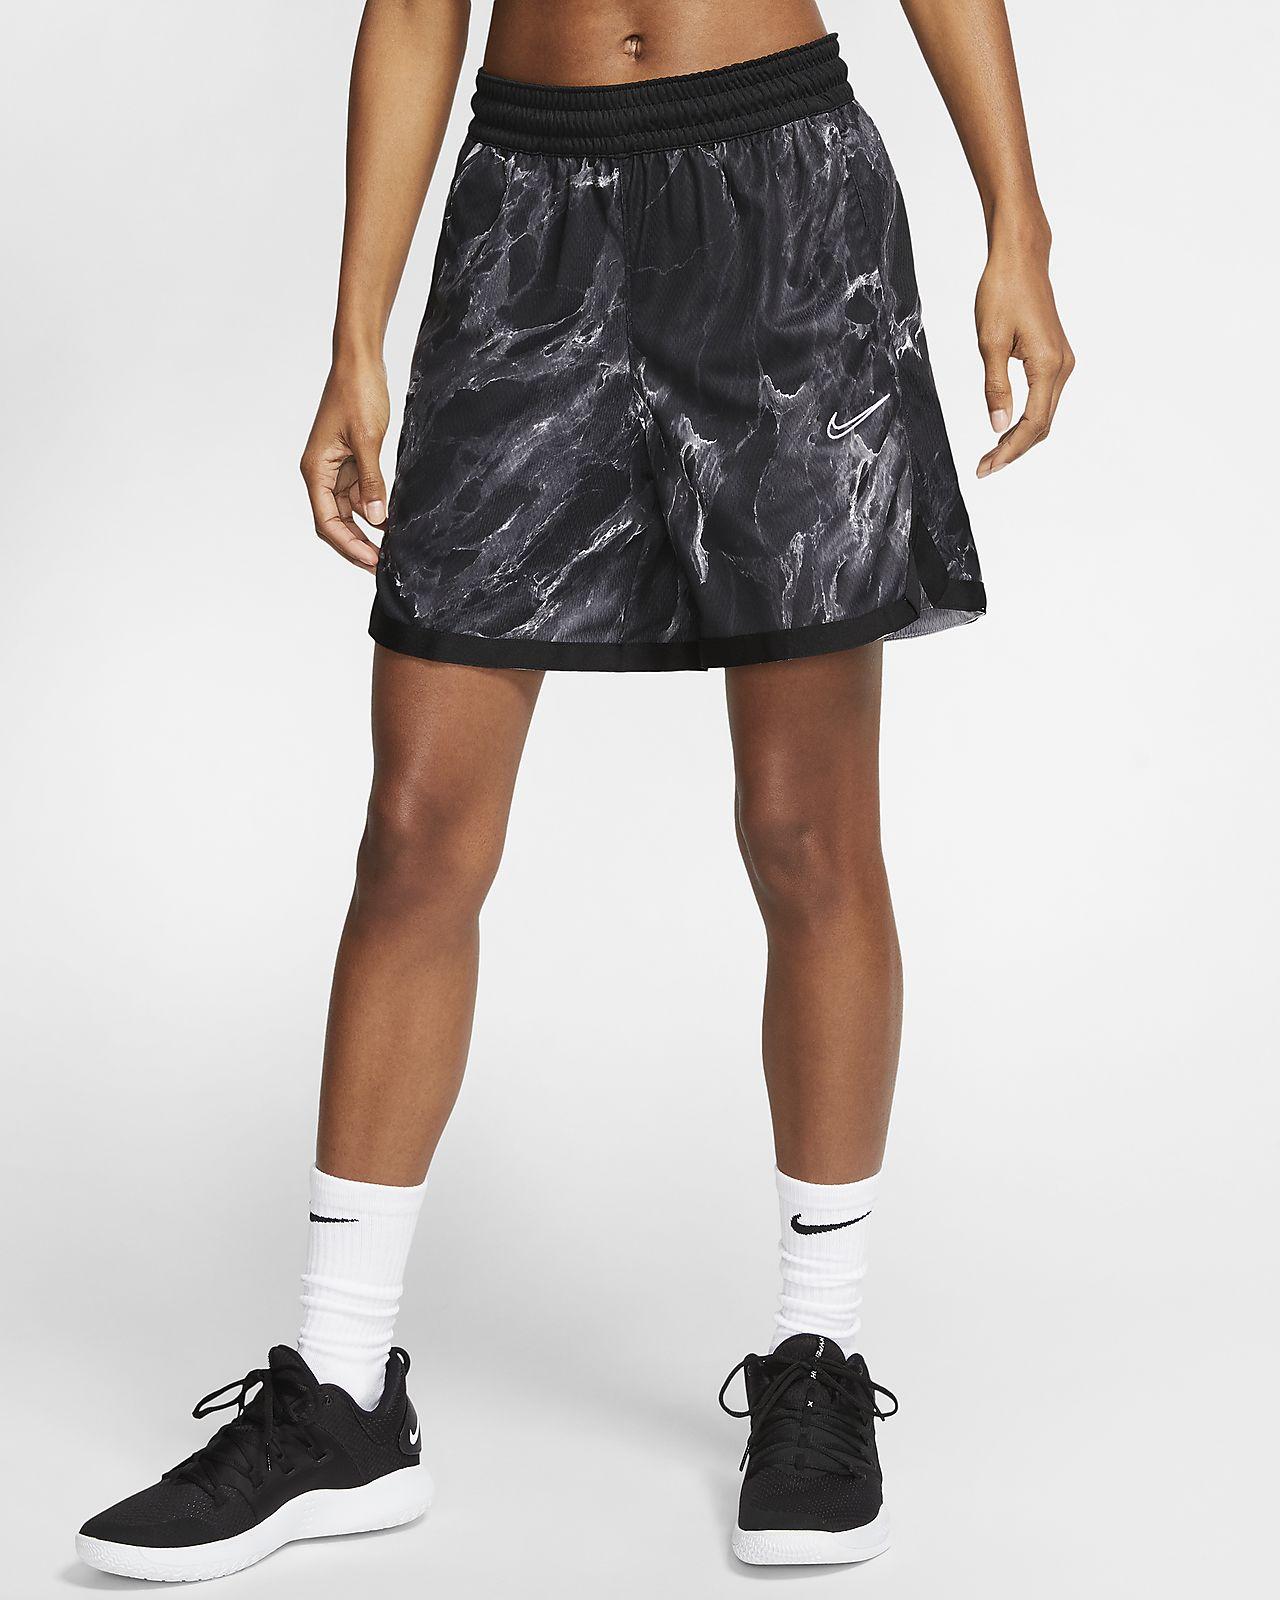 Nike Dri-FIT basketshorts til dame